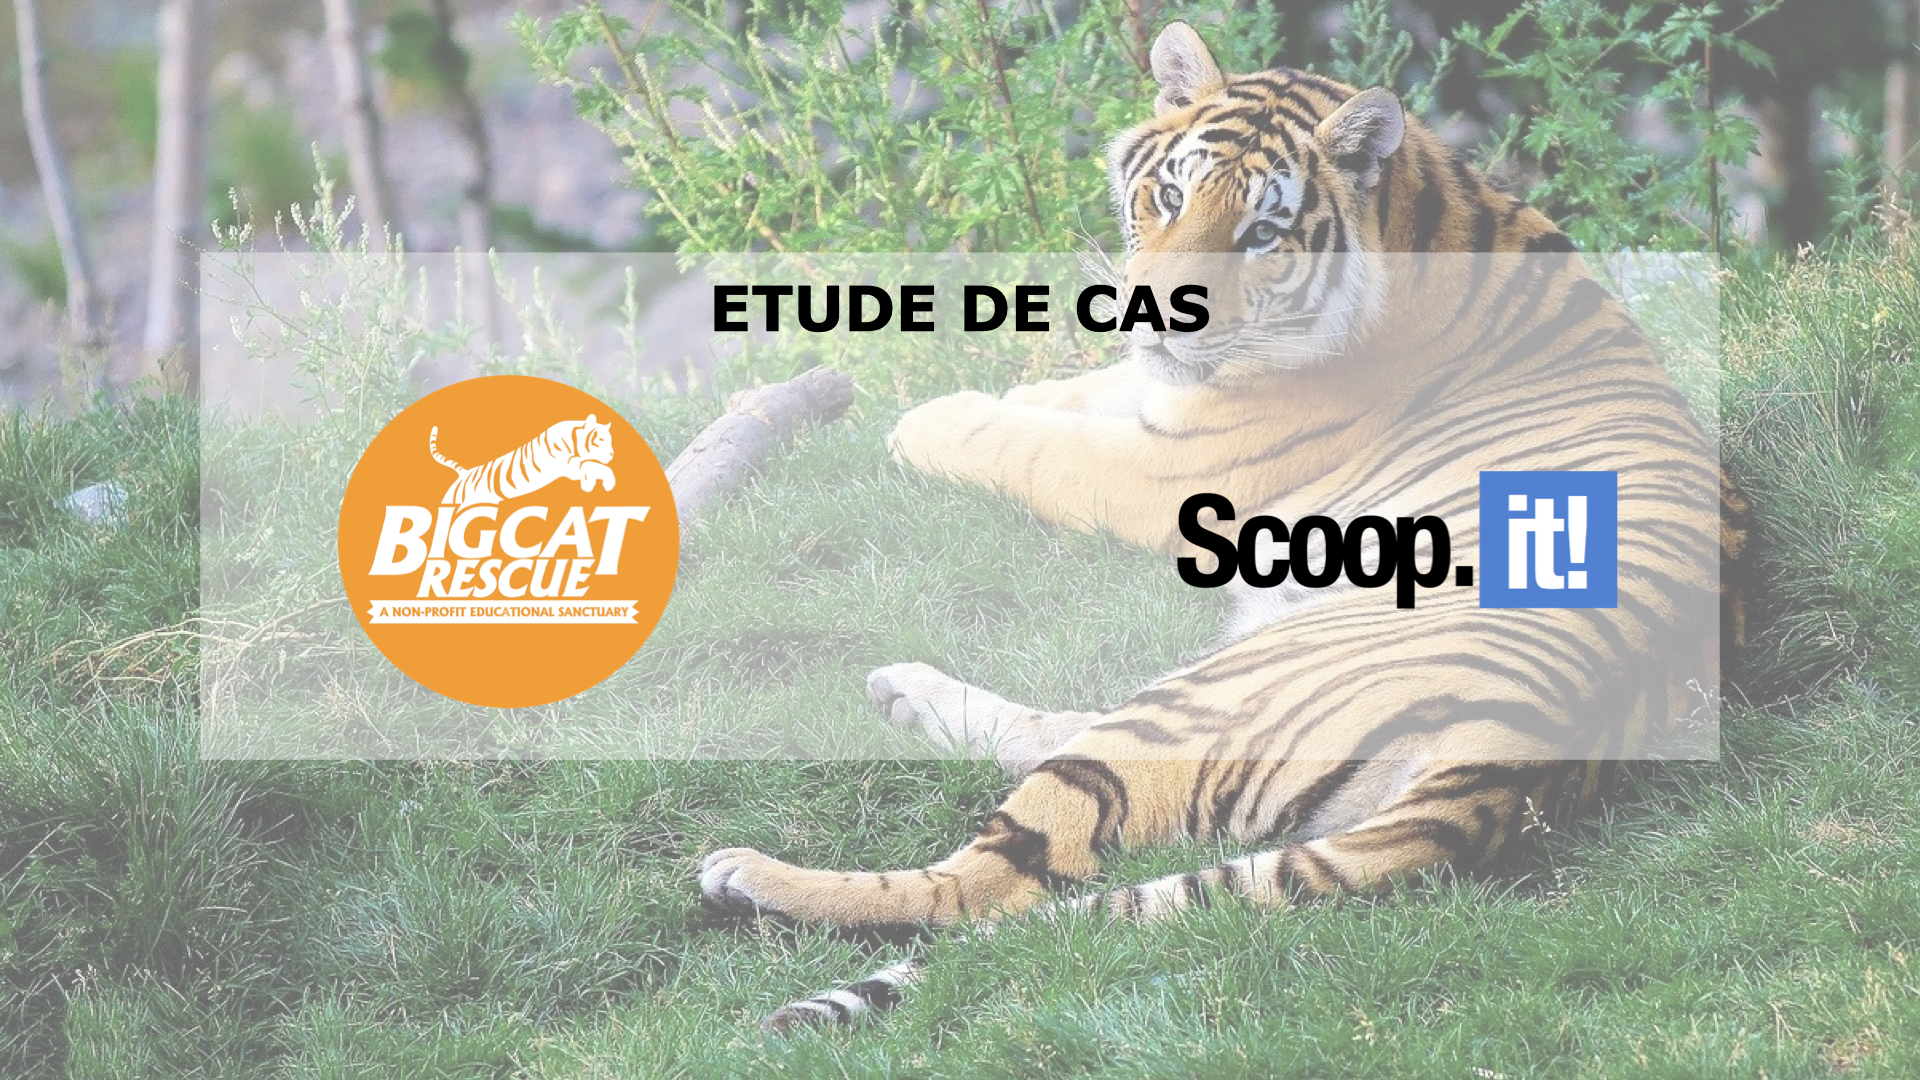 [Etude de cas] Big Cat Rescue & Scoop.it